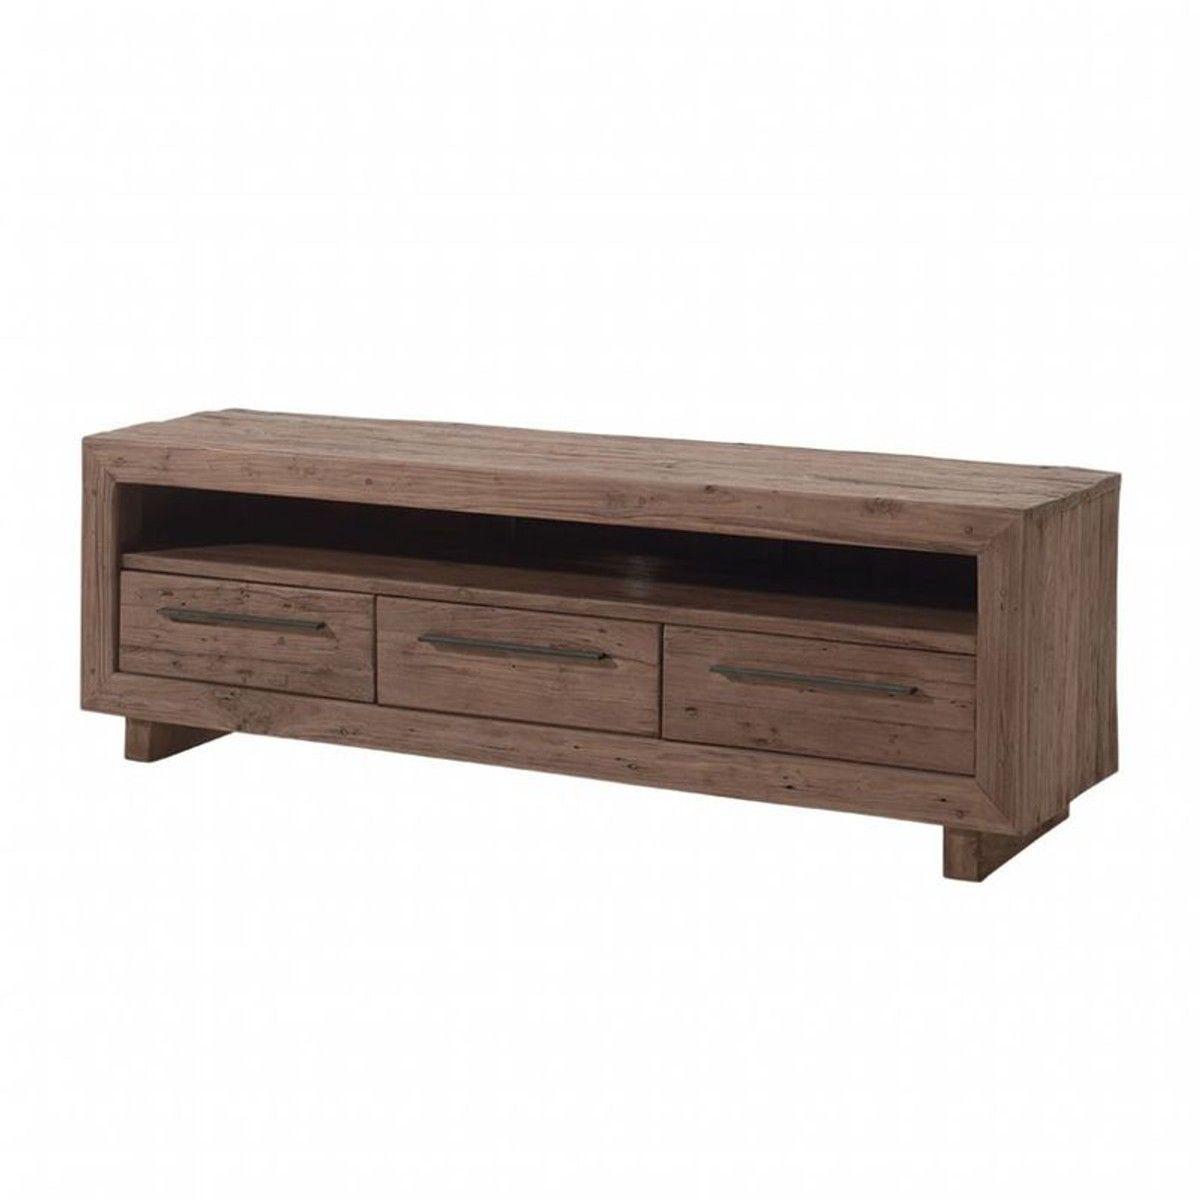 Meuble Tv Grande Taille meuble tv 160cm teck massif naturel 3 tiroirs 1 niche style